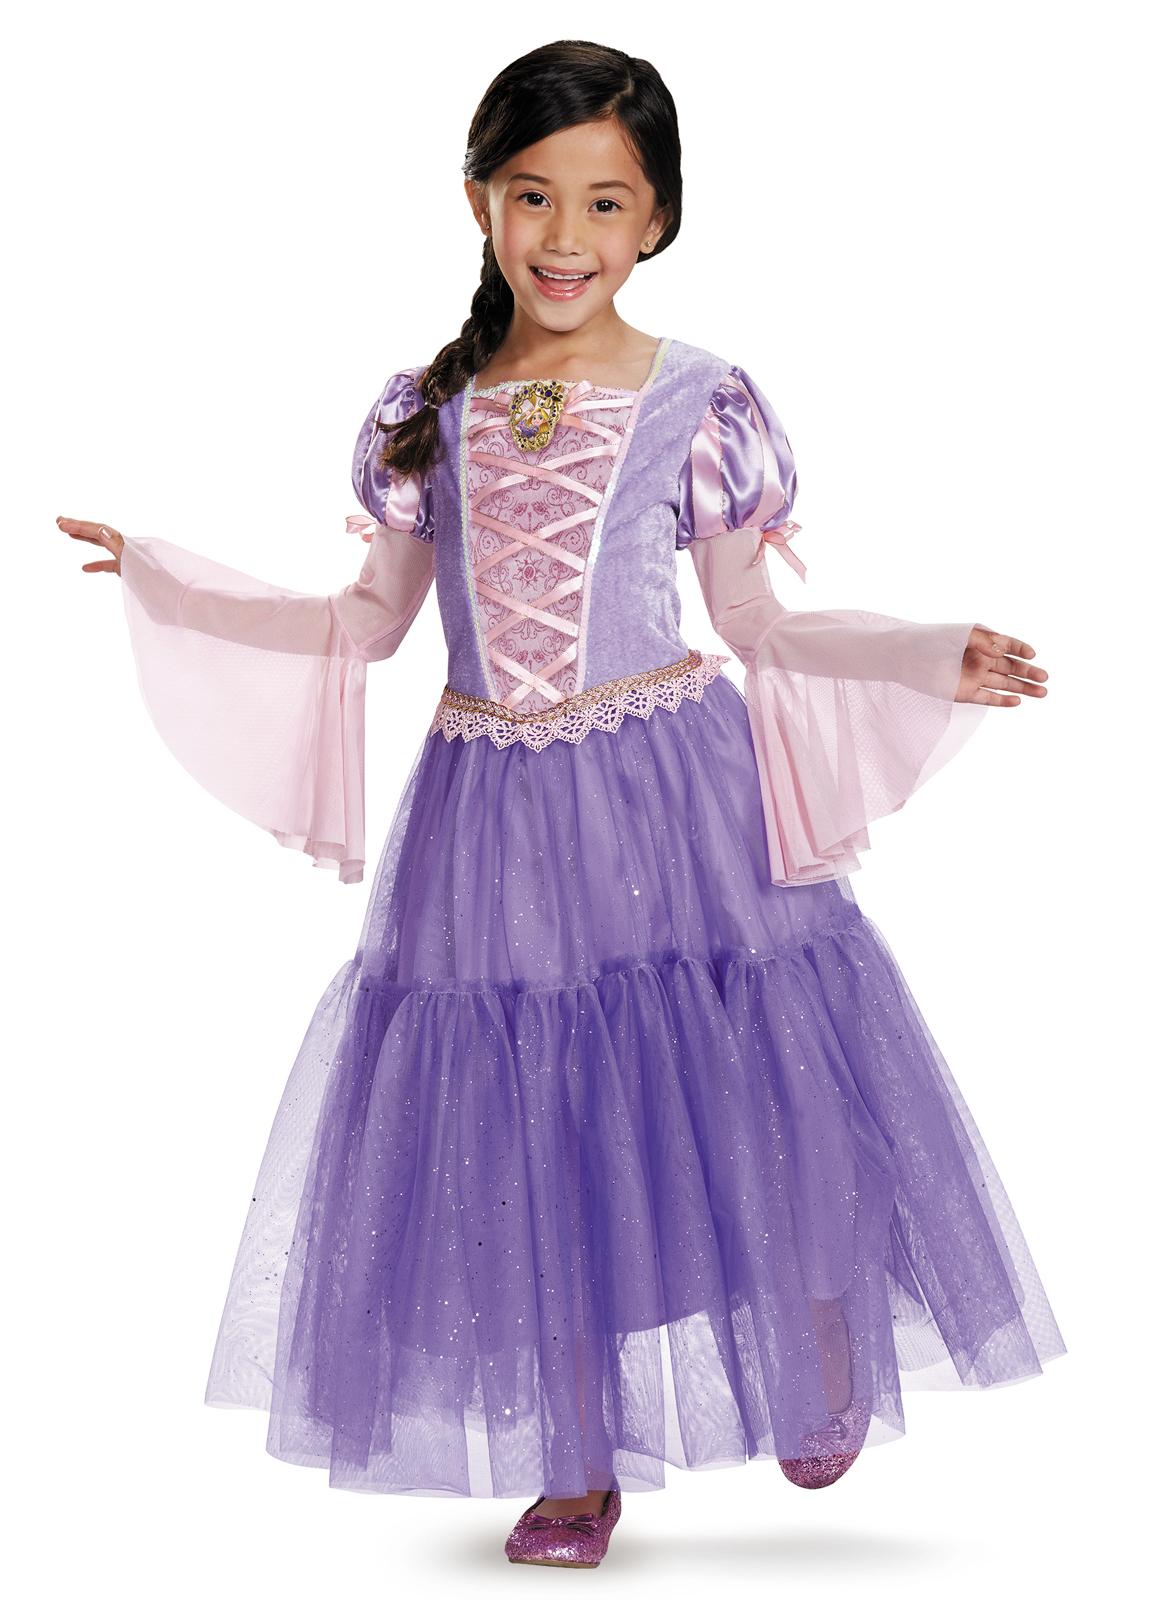 Tangled - Rapunzel Lameacute Deluxe Toddler / Child Costume